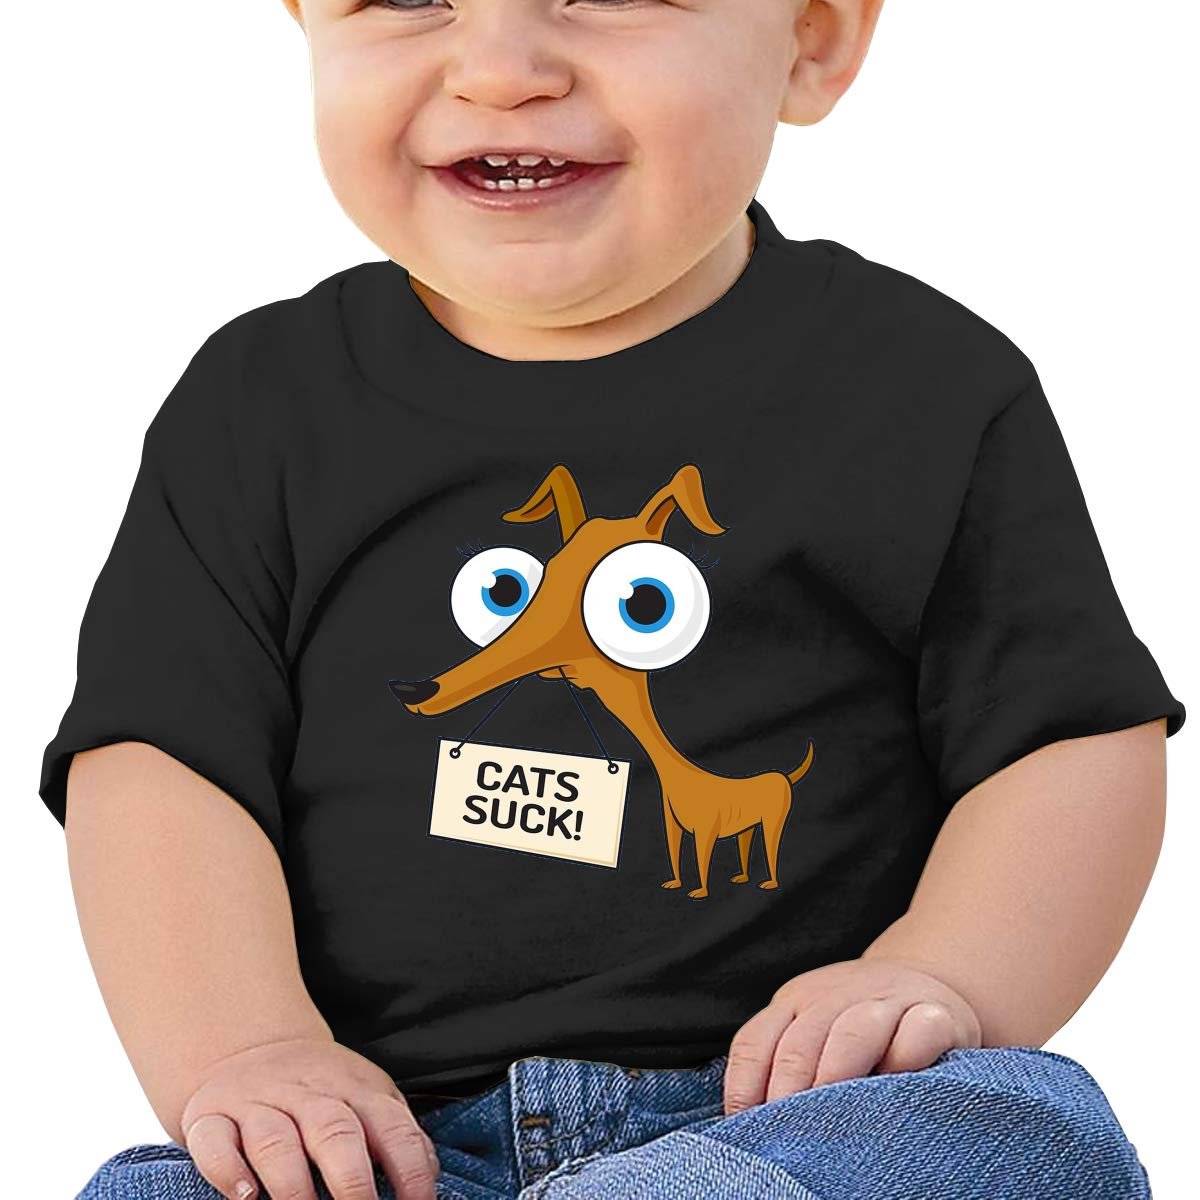 SakanpoCats Suck Toddler//Infant Short Sleeve Cotton T Shirts Black